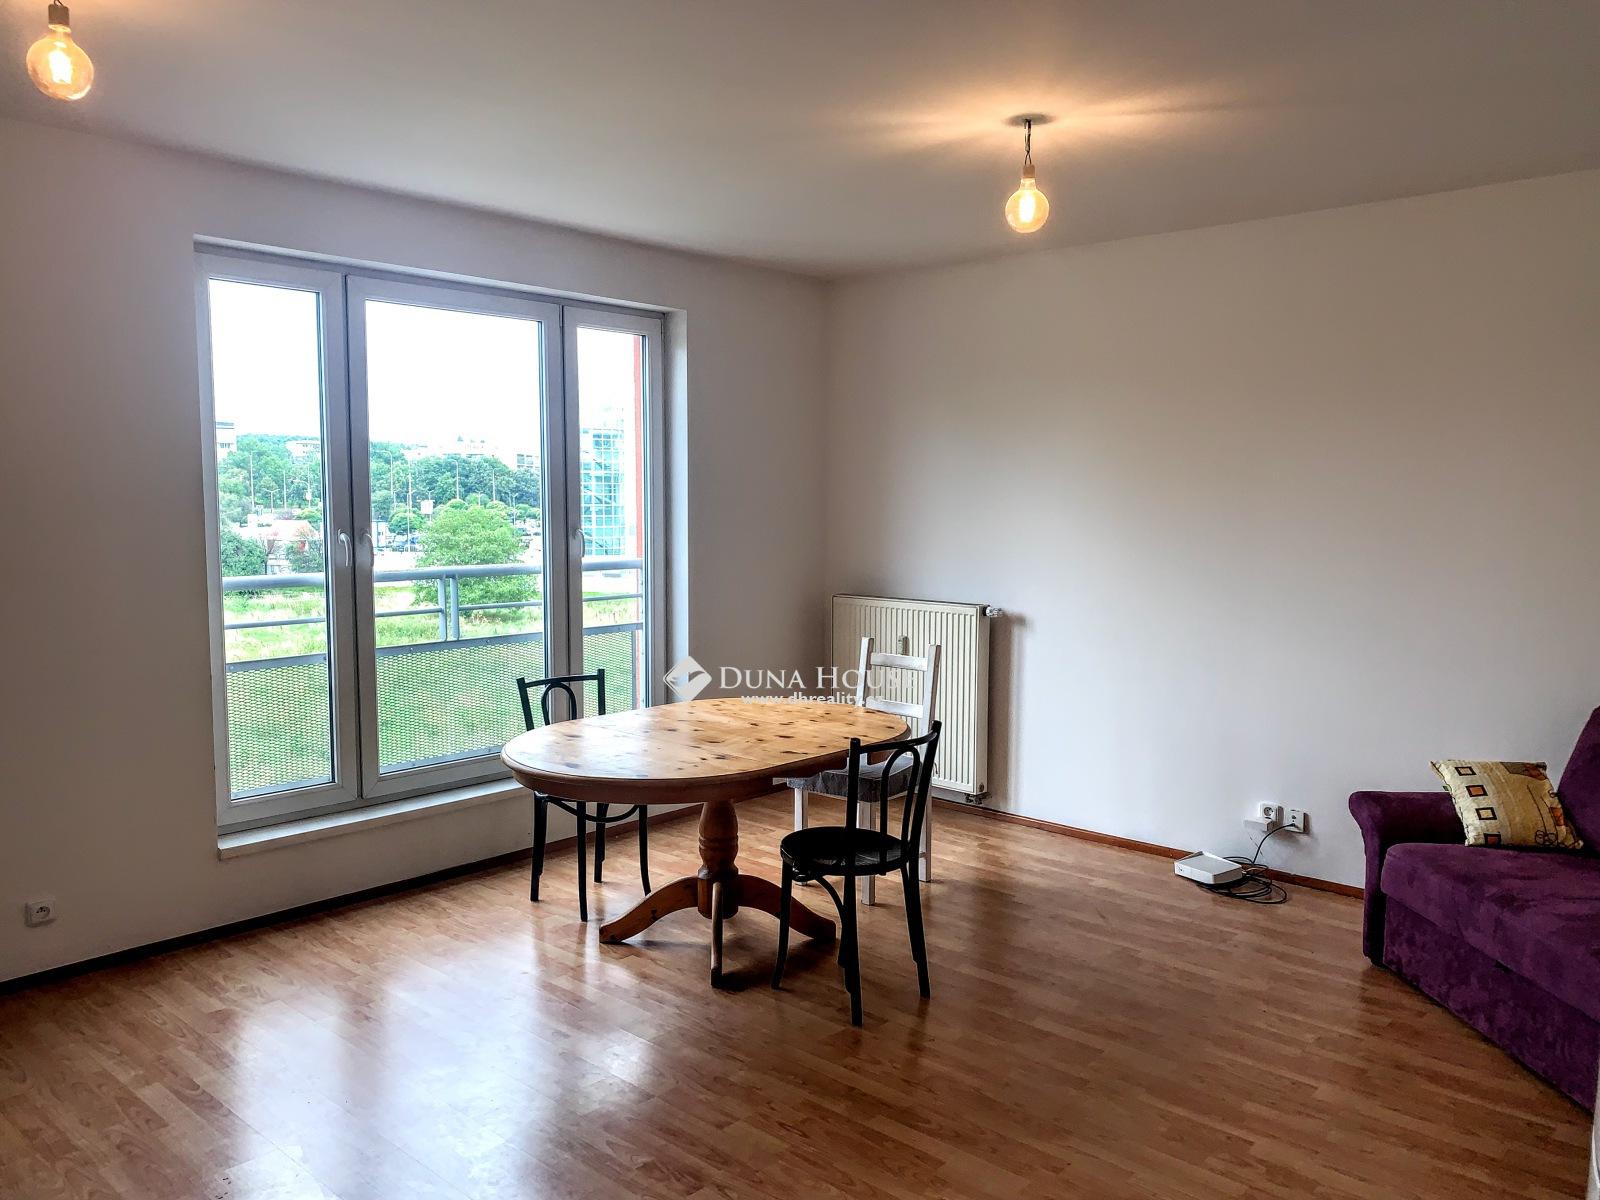 Pronájem bytu, Mattioliho, Praha 10 Záběhlice